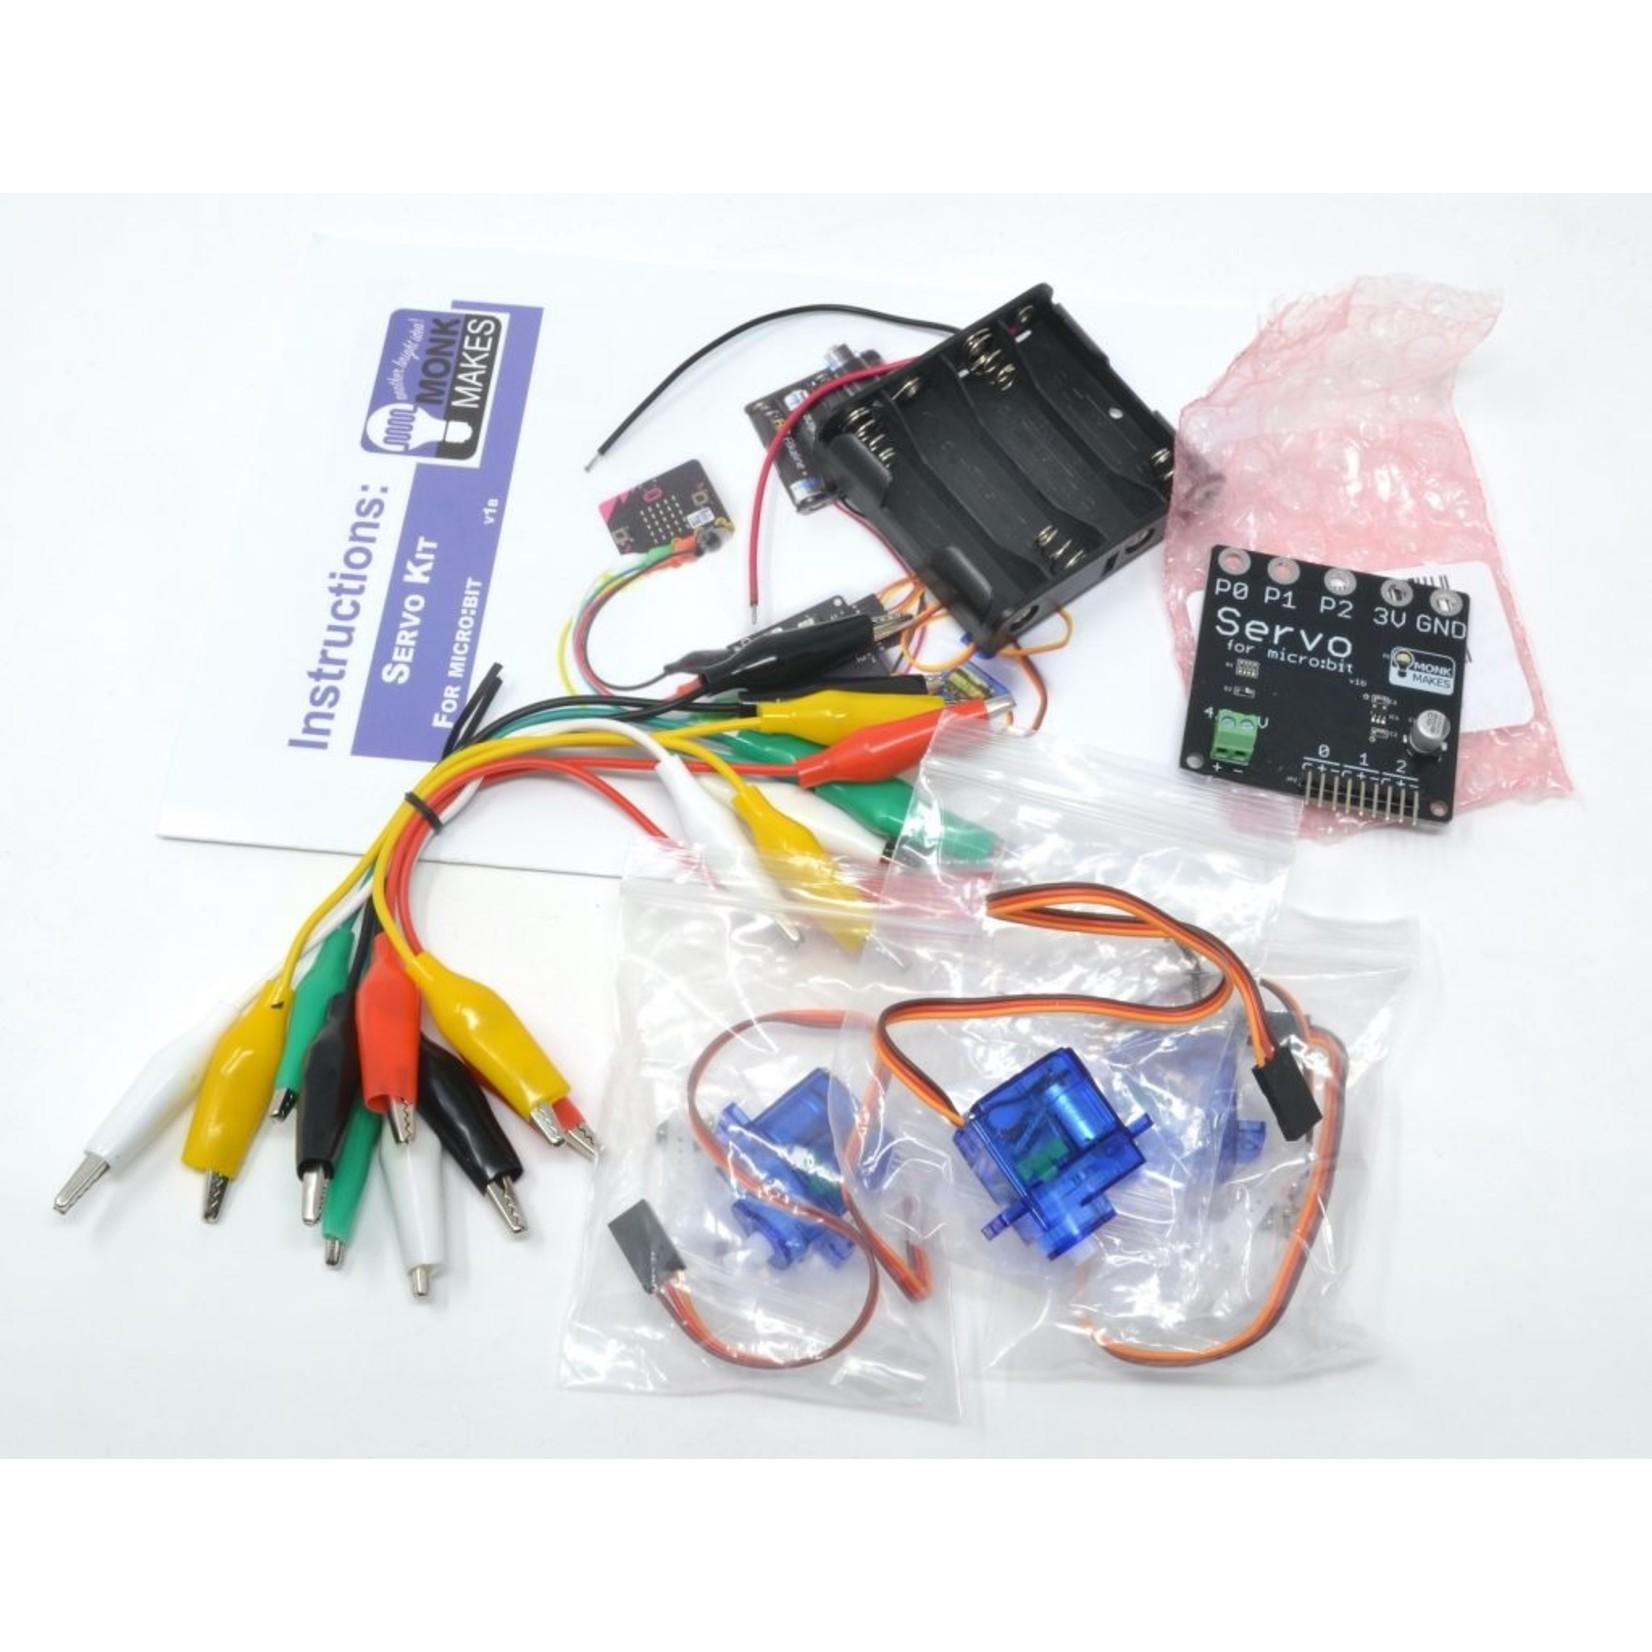 MonkMakes Servo Kit for micro:bit